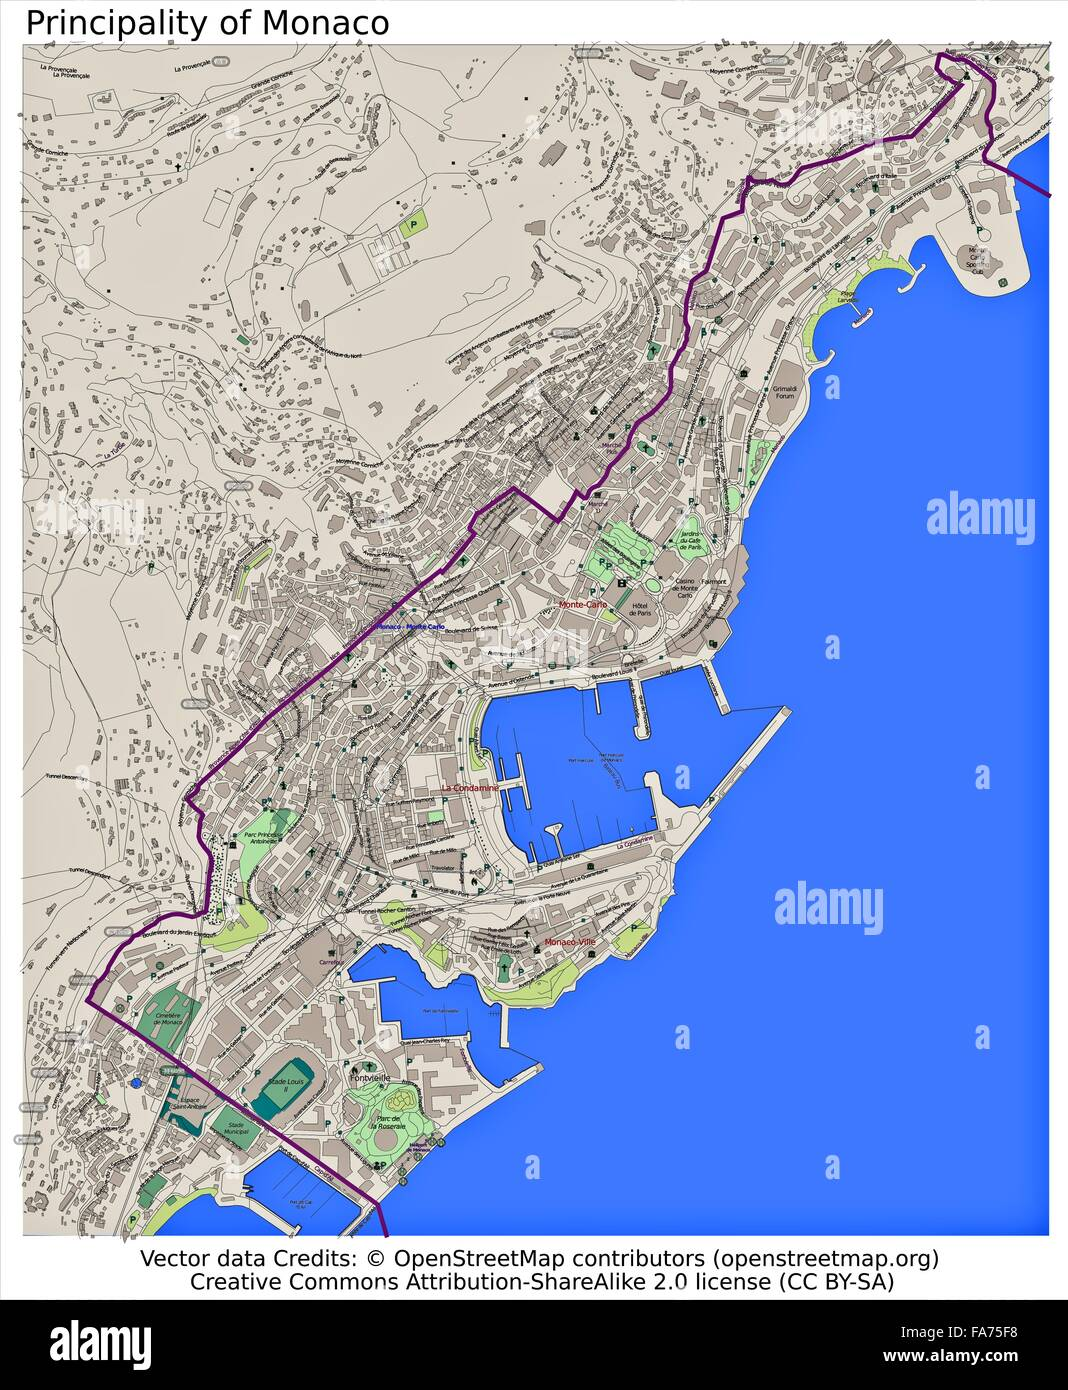 Monaco Principality location map Stock Photo Royalty Free Image